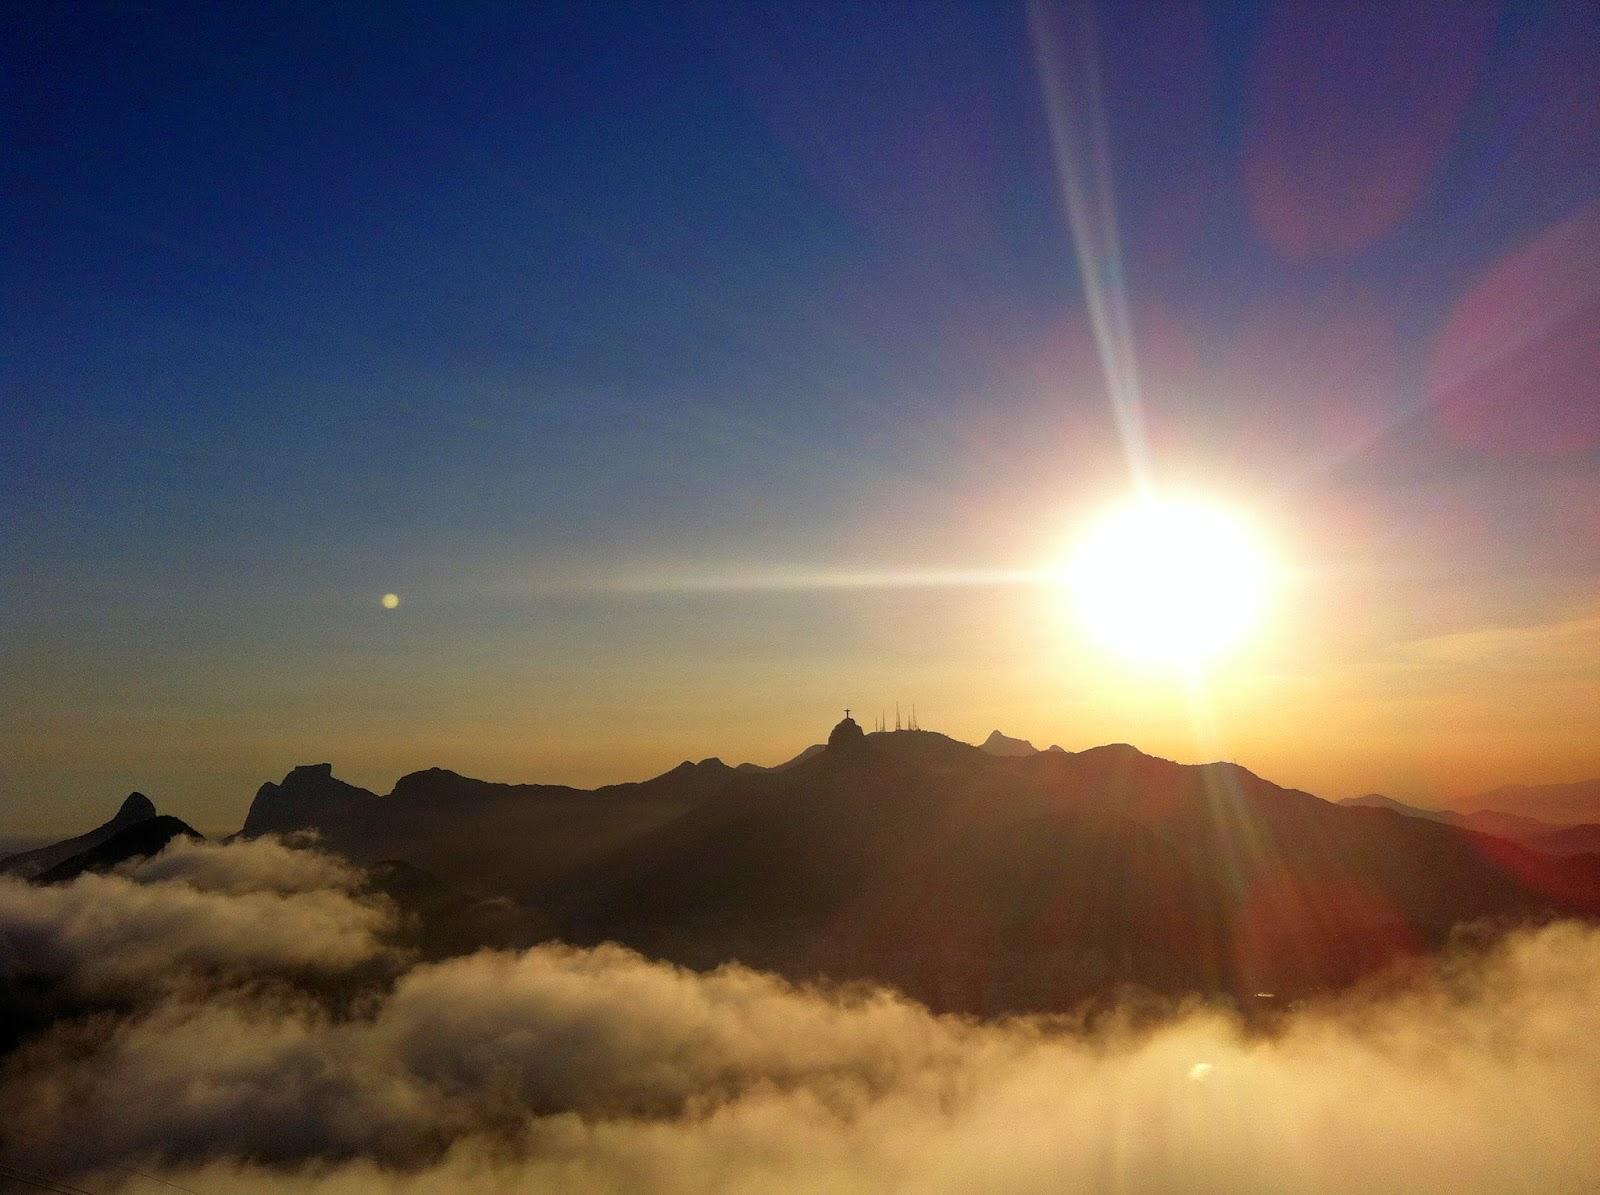 Sunset from Sugarloaf Mountain Rio de Janeiro